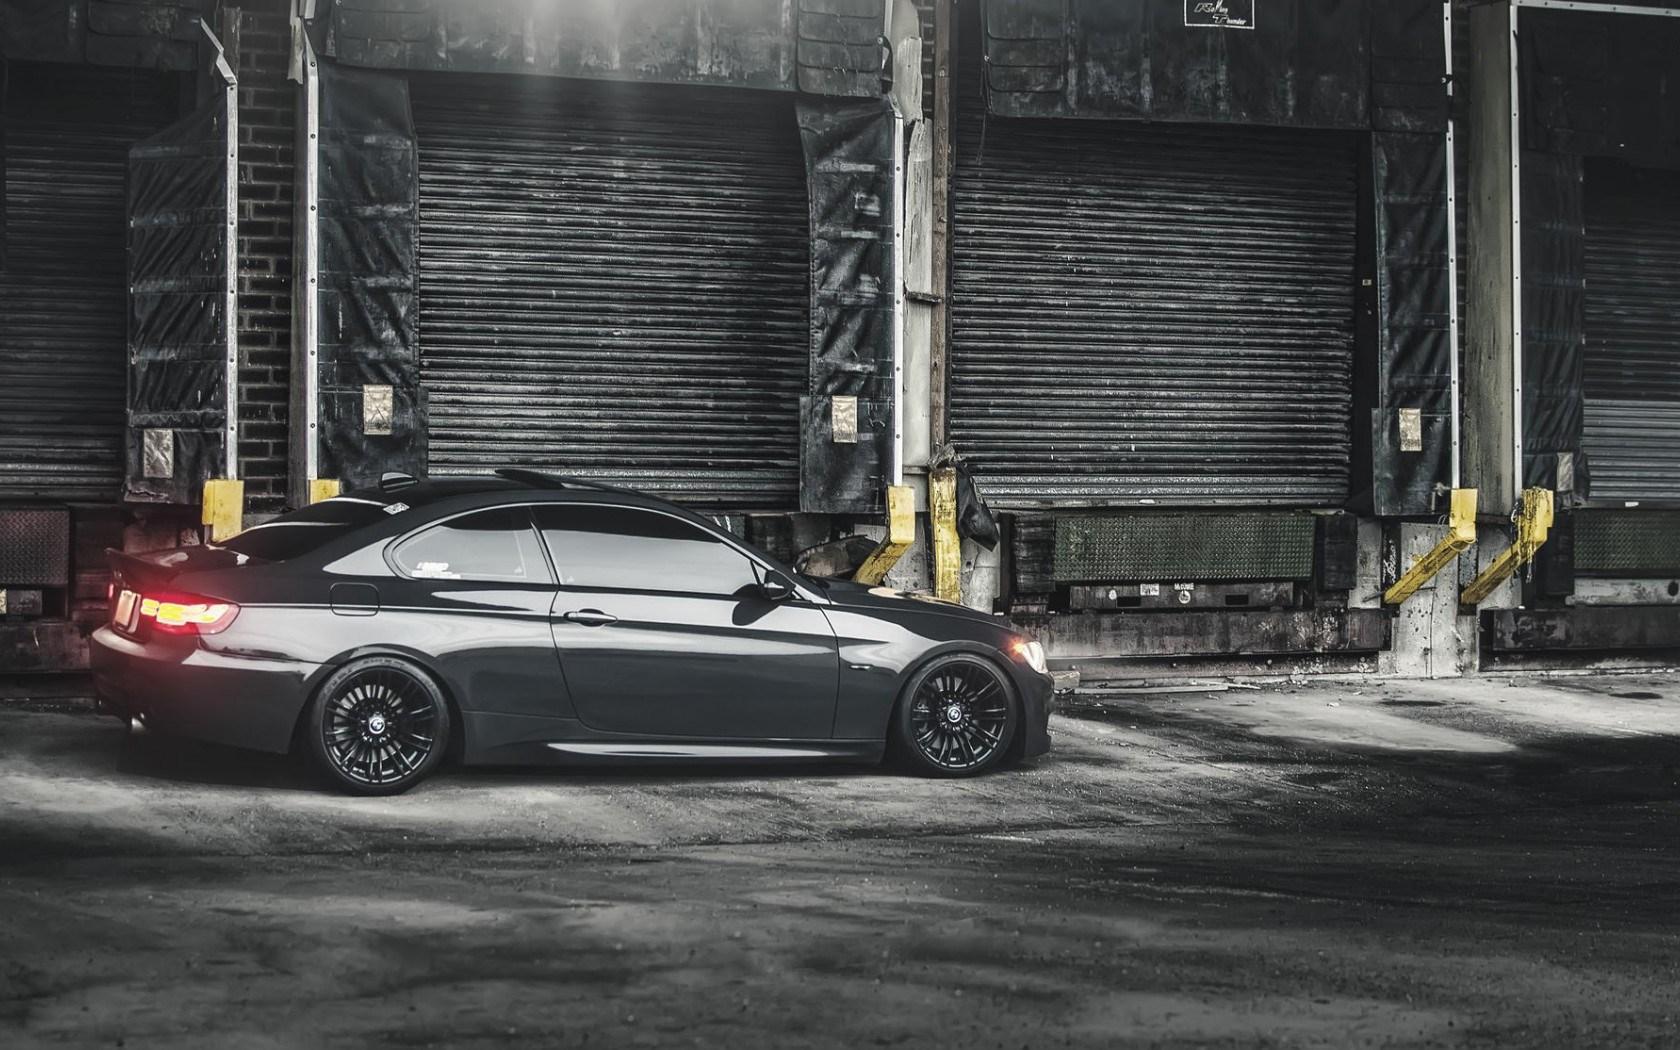 BMW E90 328i Car Front